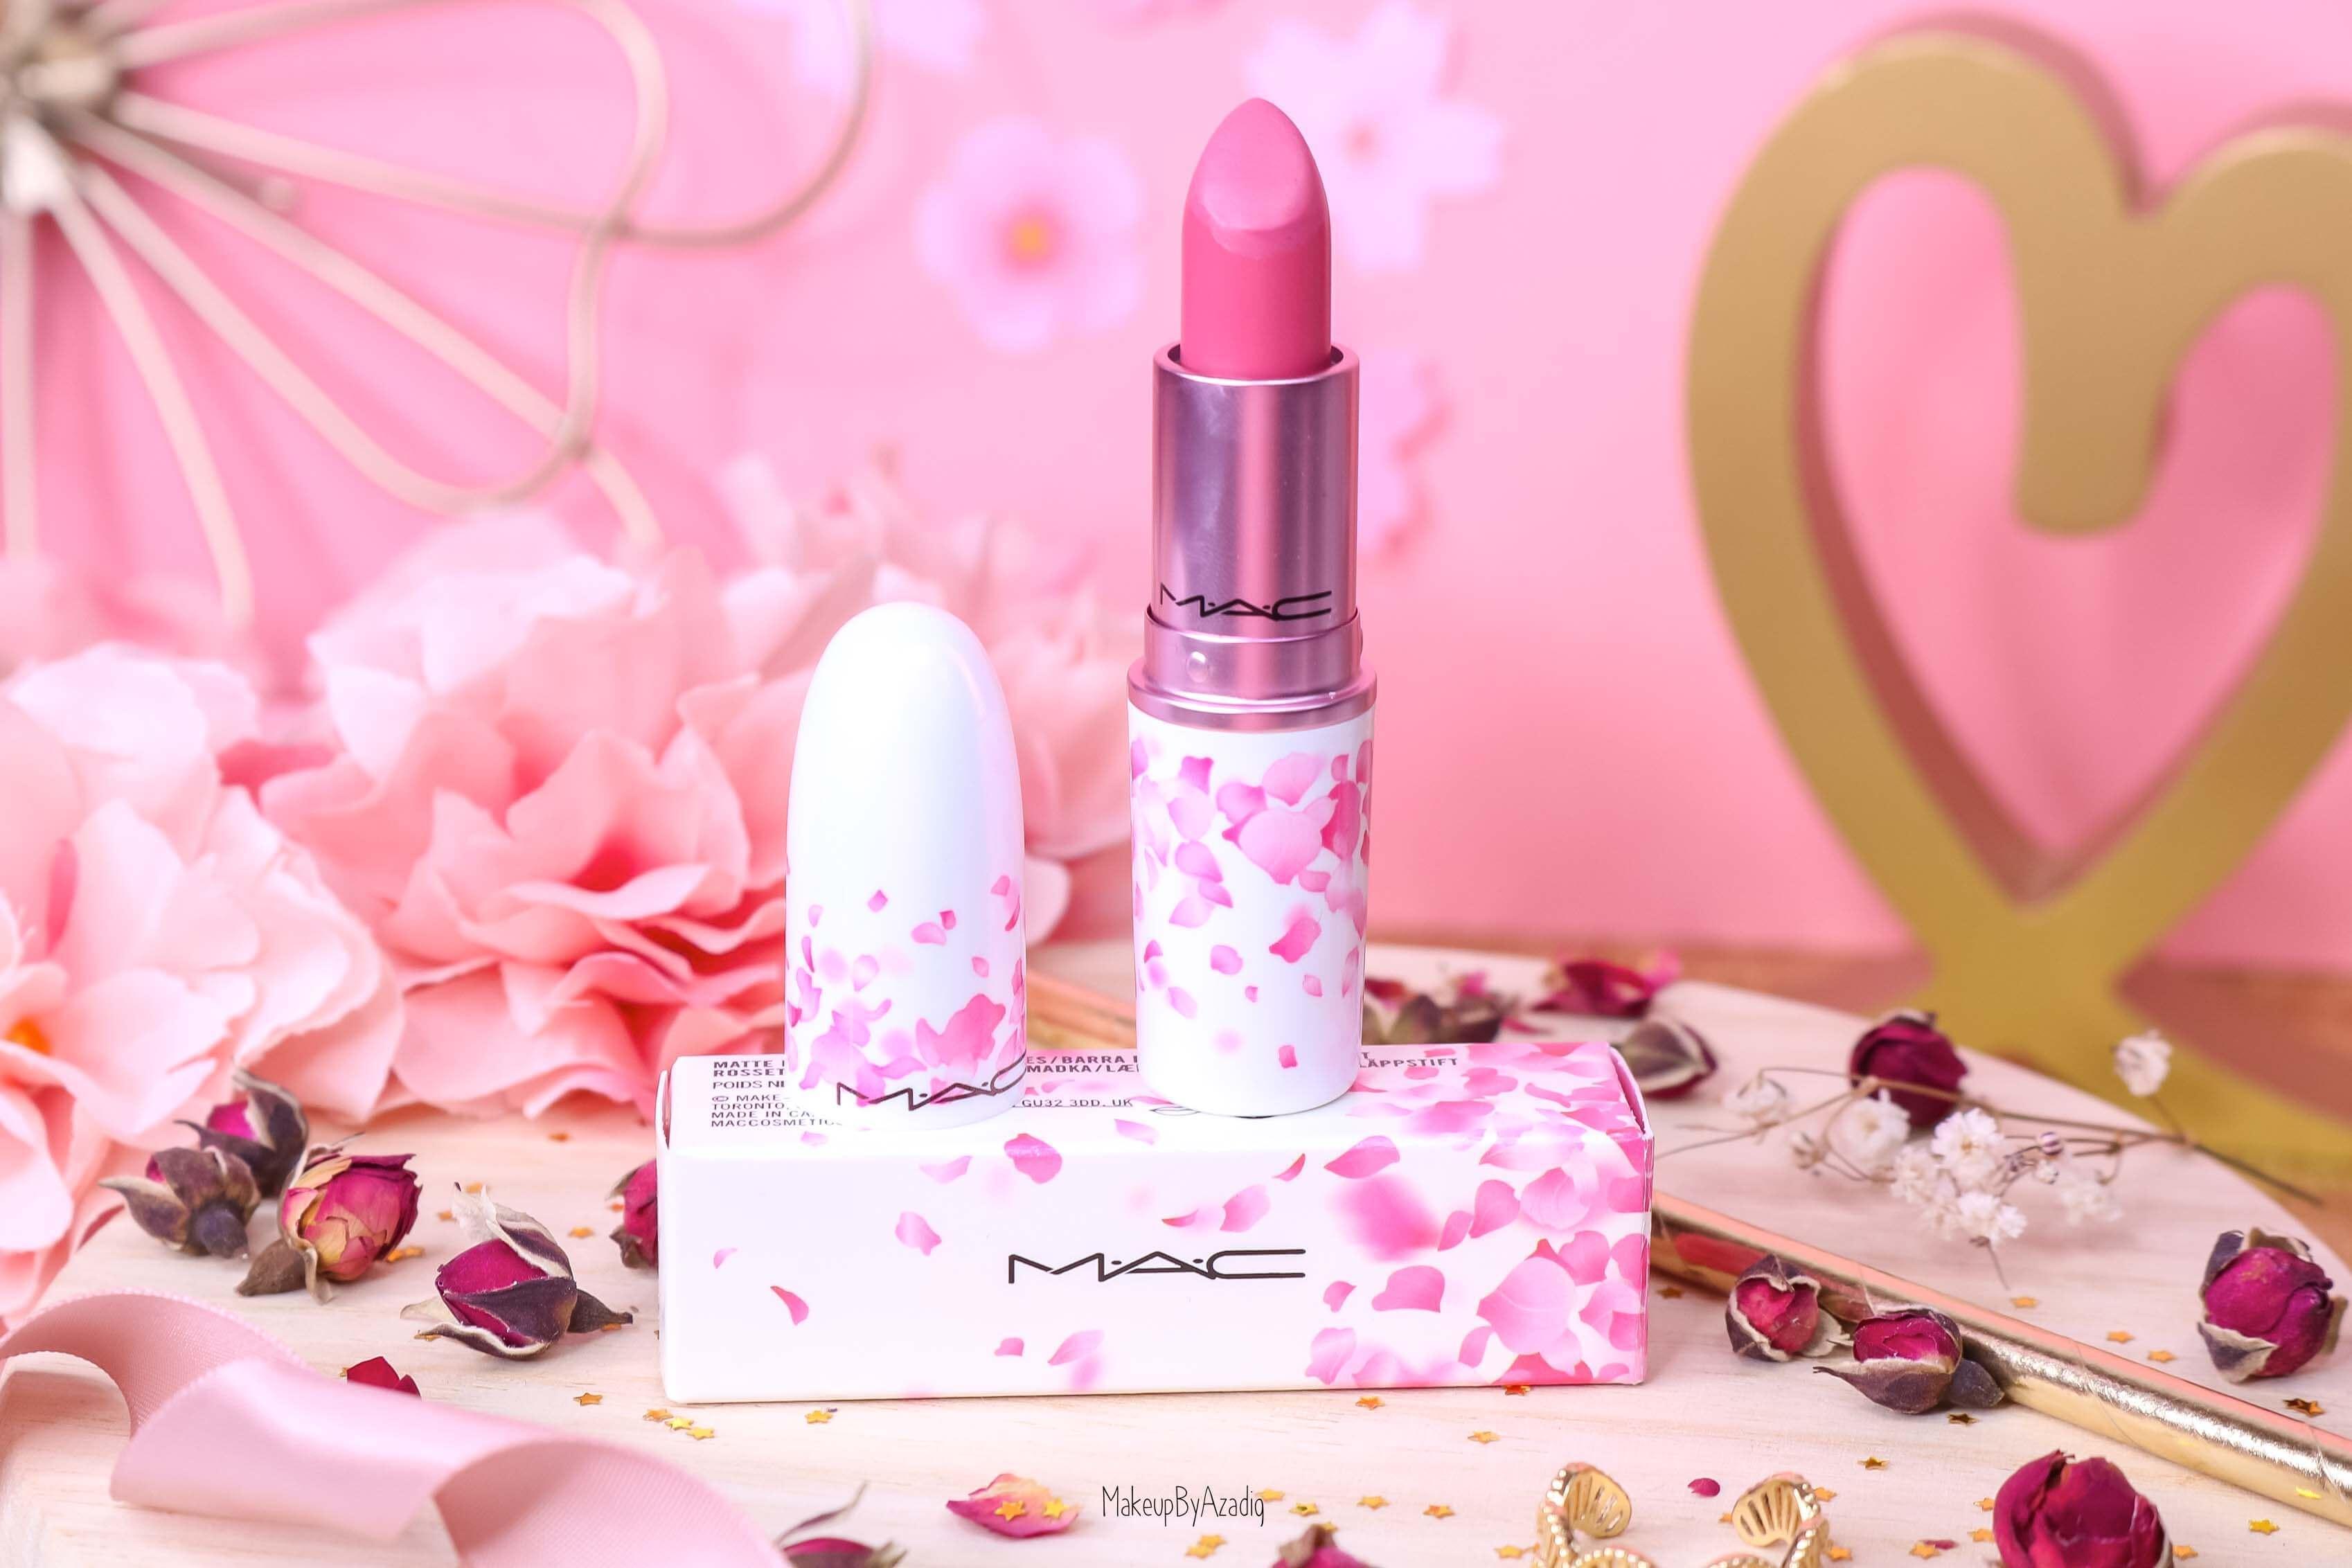 revue-rouge-a-levres-mac-cosmetics-collection-boom-boom-bloom-printemps-makeupbyazadig-avis-swatch-prix-france-rose